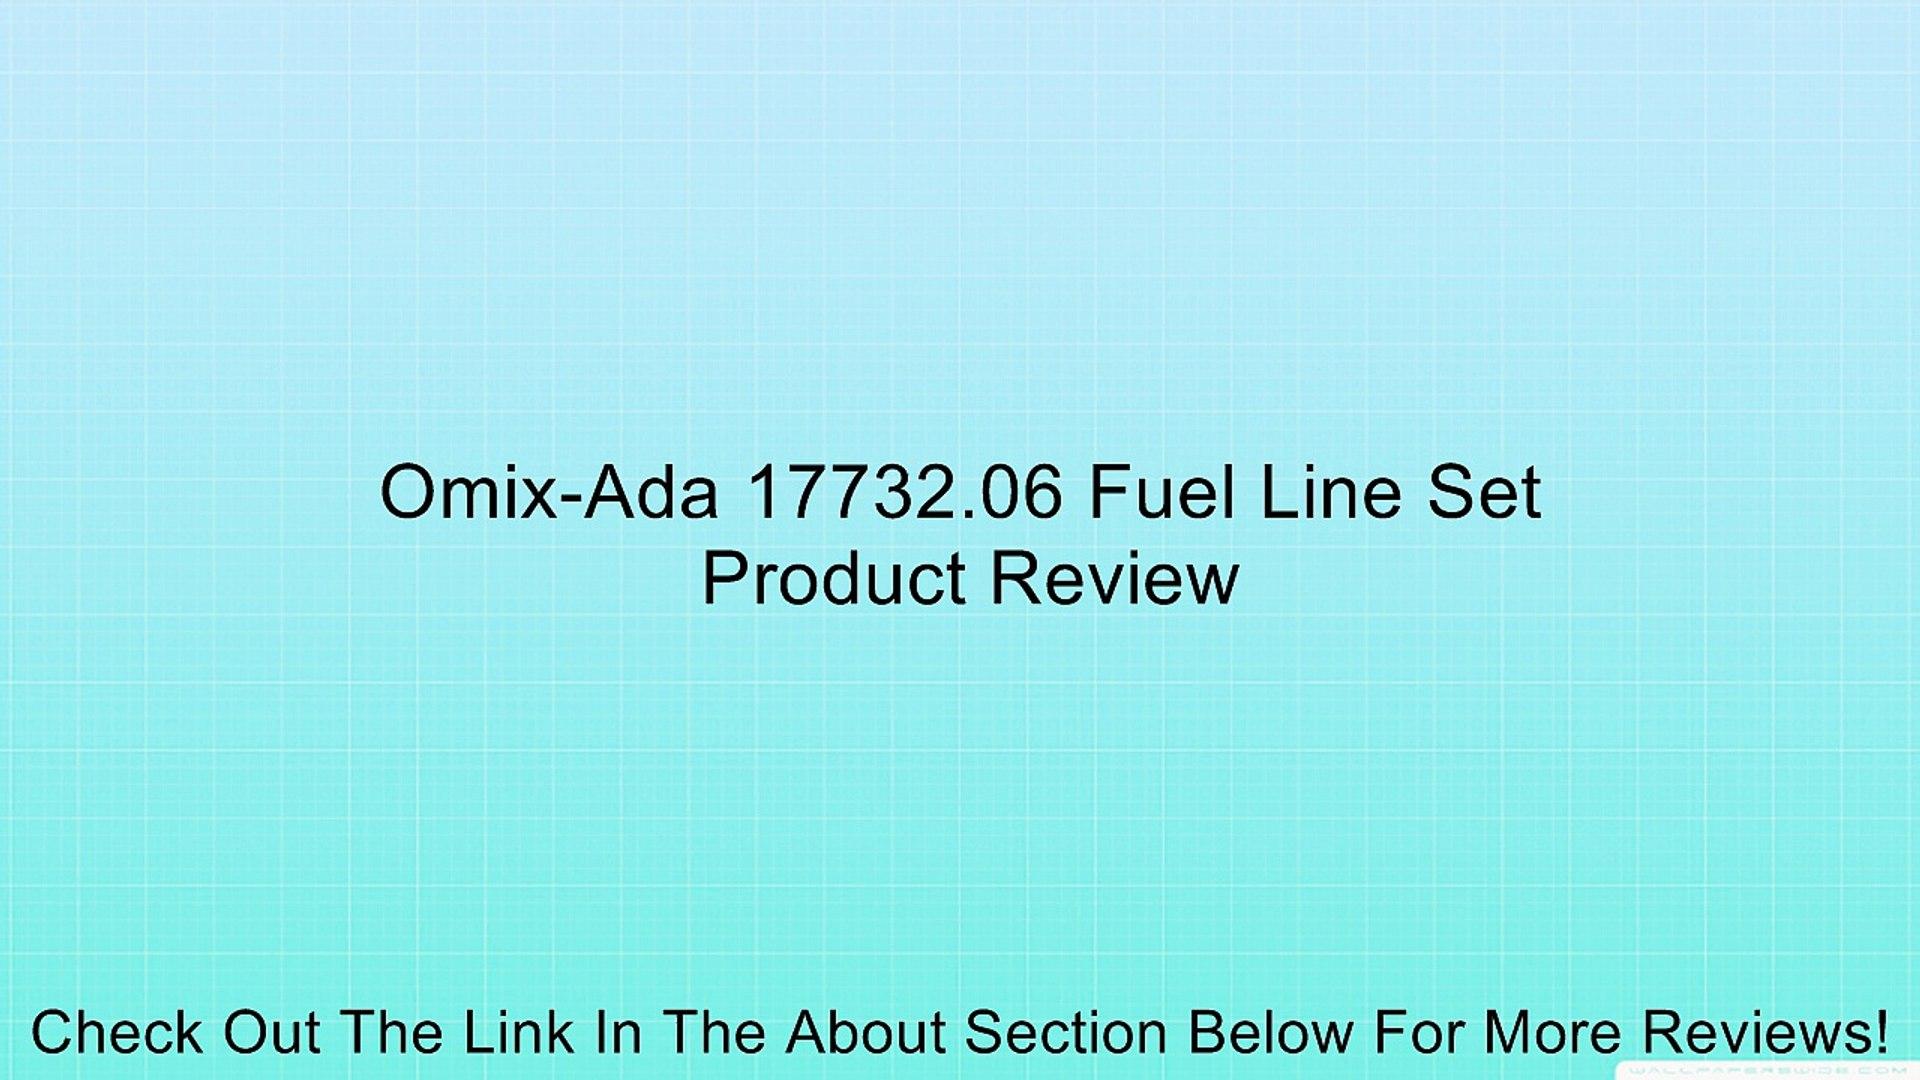 Omix-Ada 17732.06 Fuel Line Set